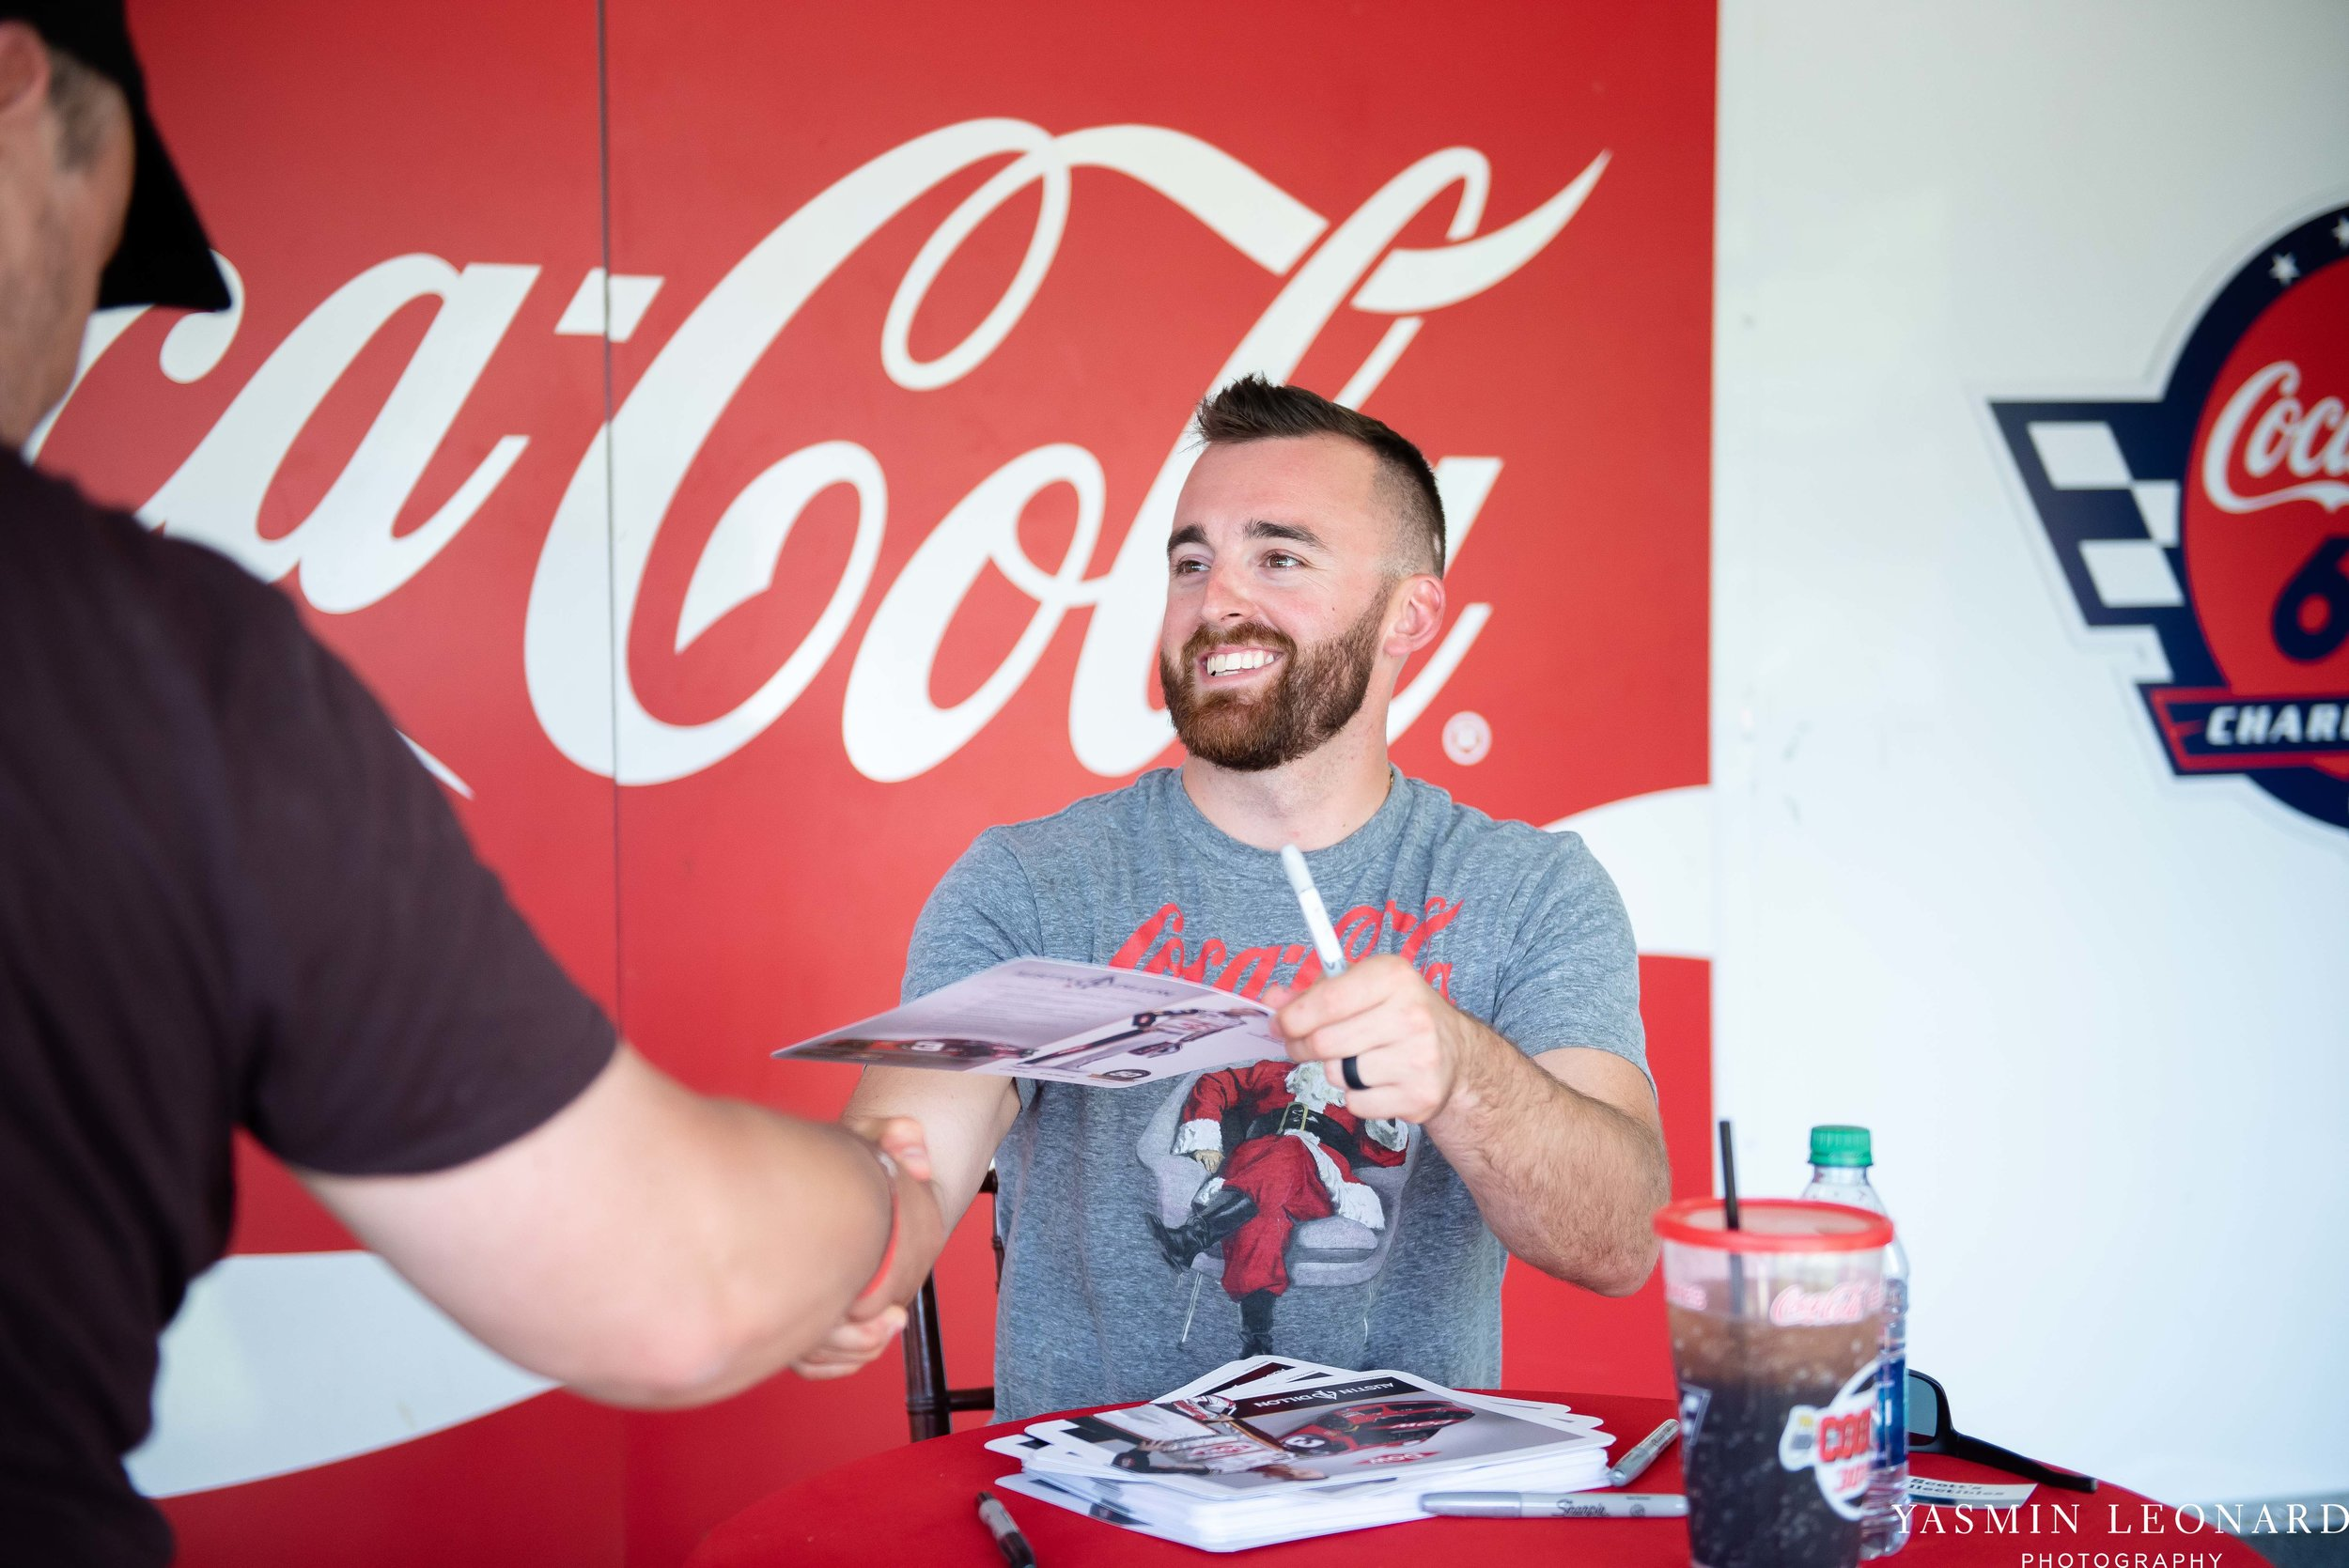 Cookout - CocaCola 600 - Coca Cola - Austin Dillon - Nascar - Nascar Meet and Greet - Yasmin Leonard Photography-18.jpg